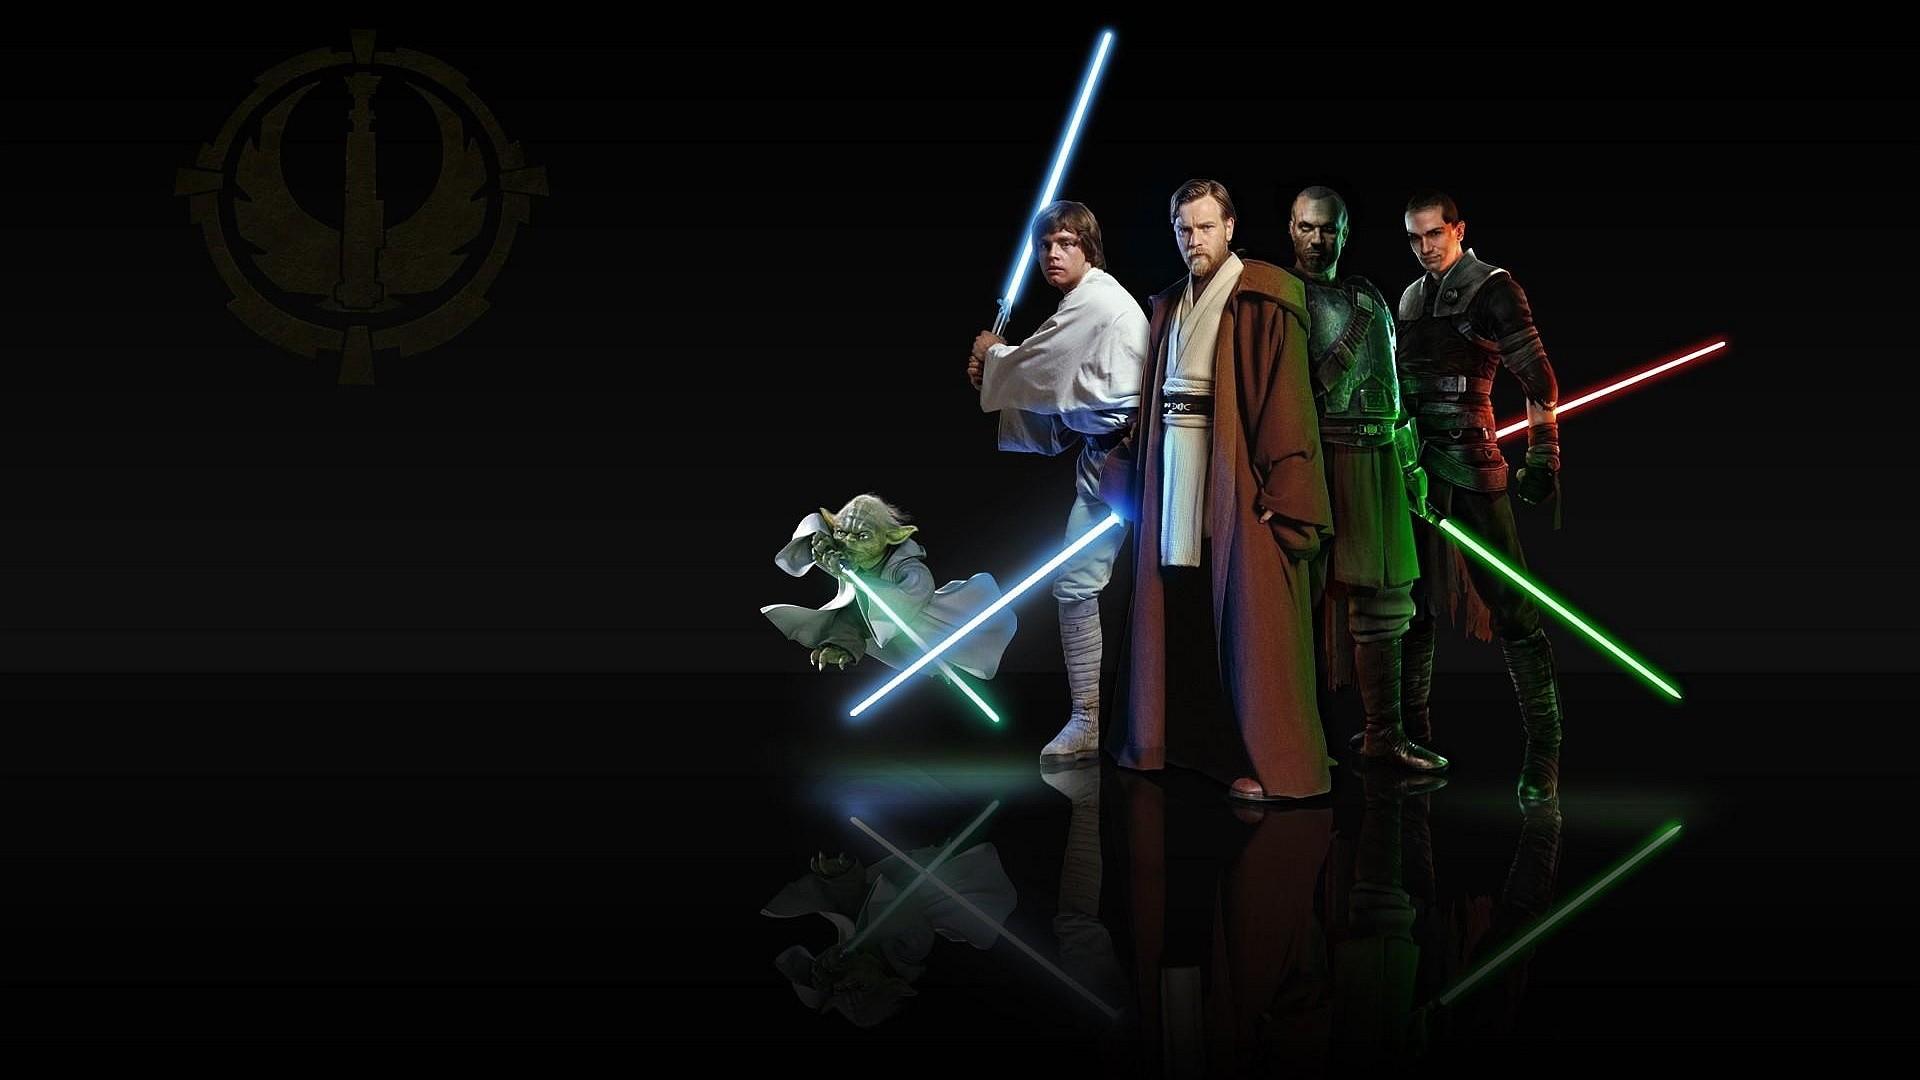 3d Star Wars Wallpaper   Free HD Desktop Background Wallpaper – Free .